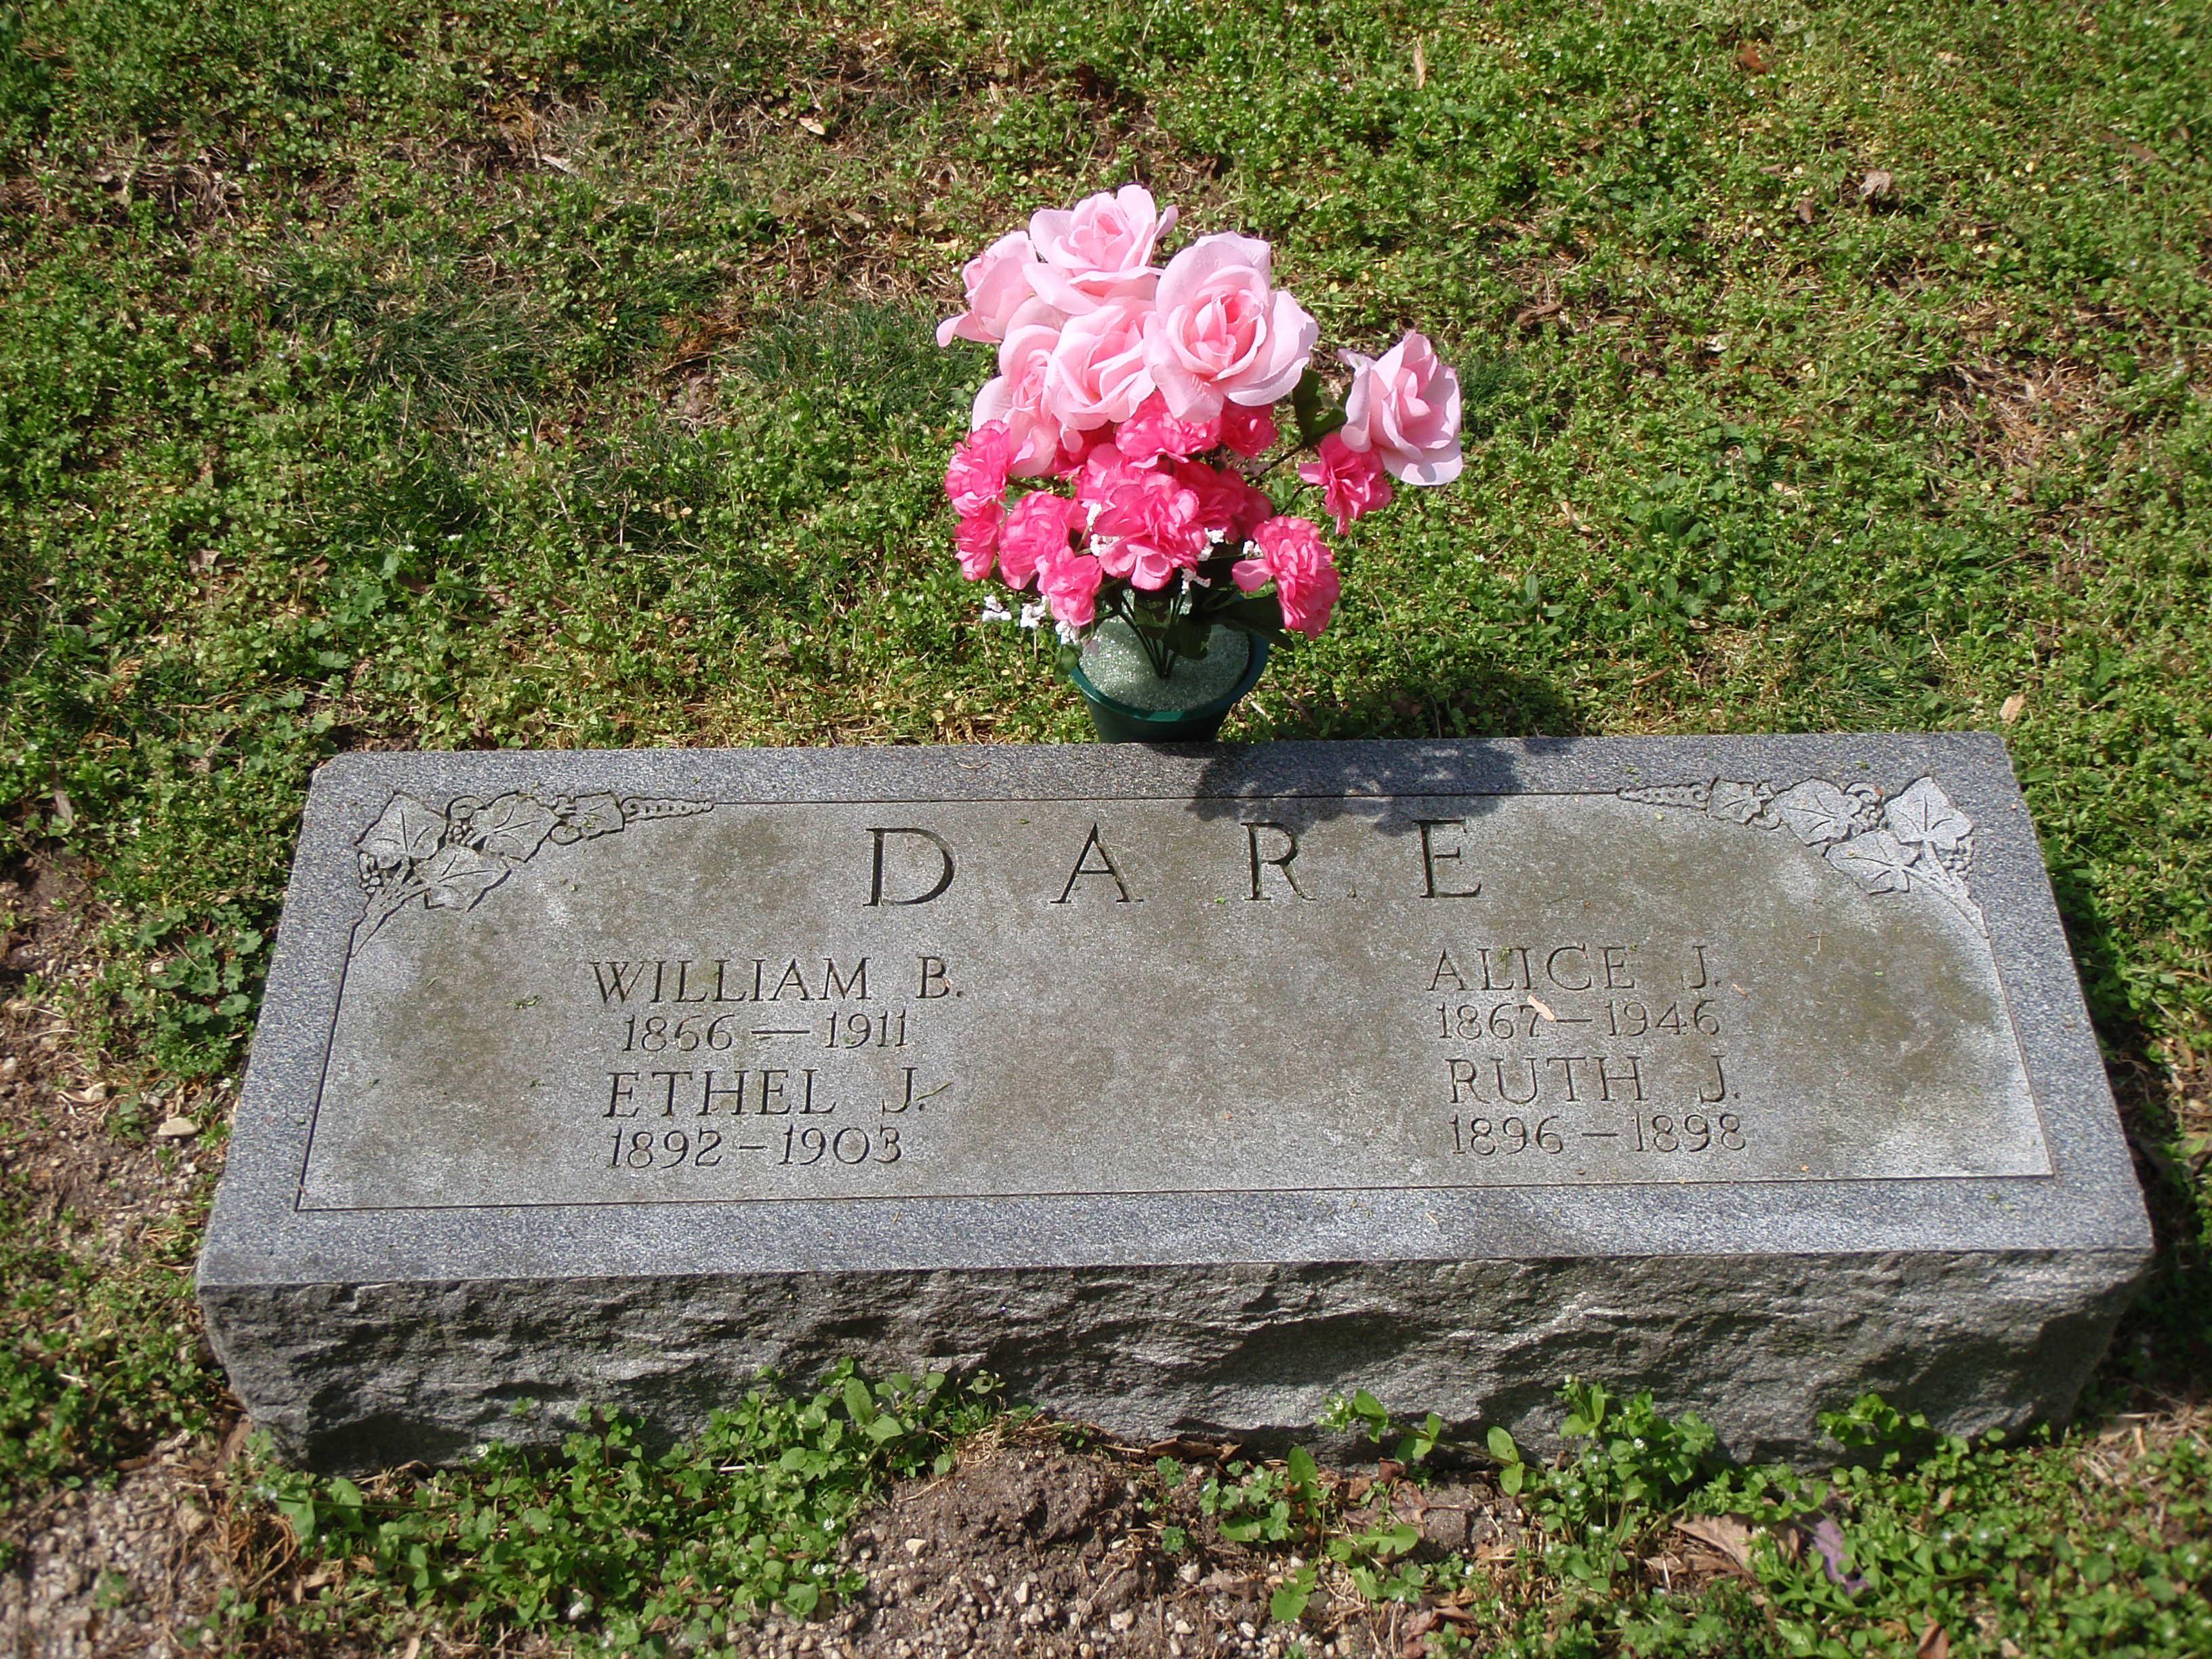 Ruth J. Dare